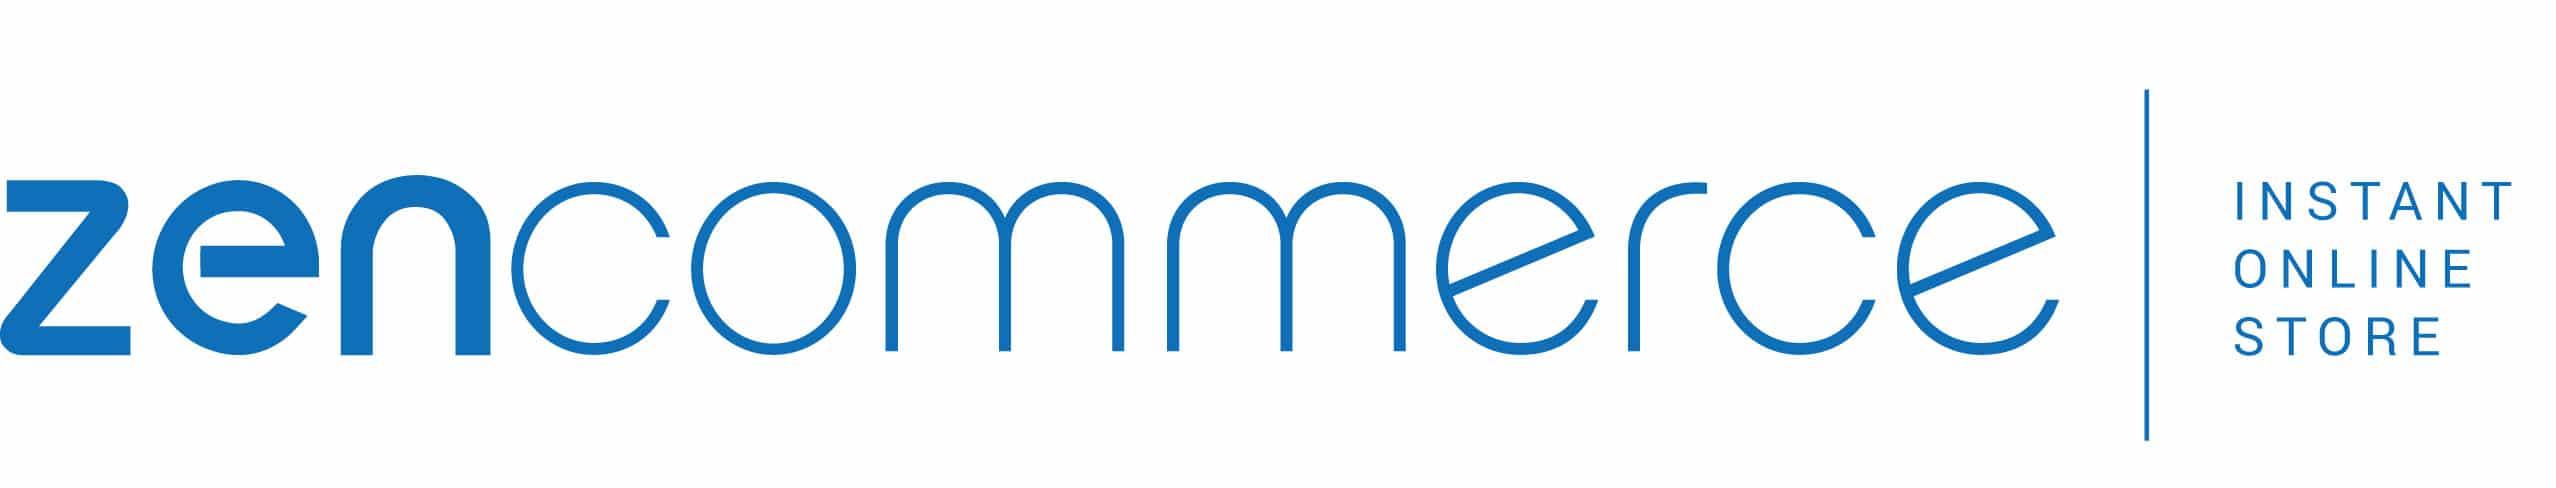 zencommerce-logo